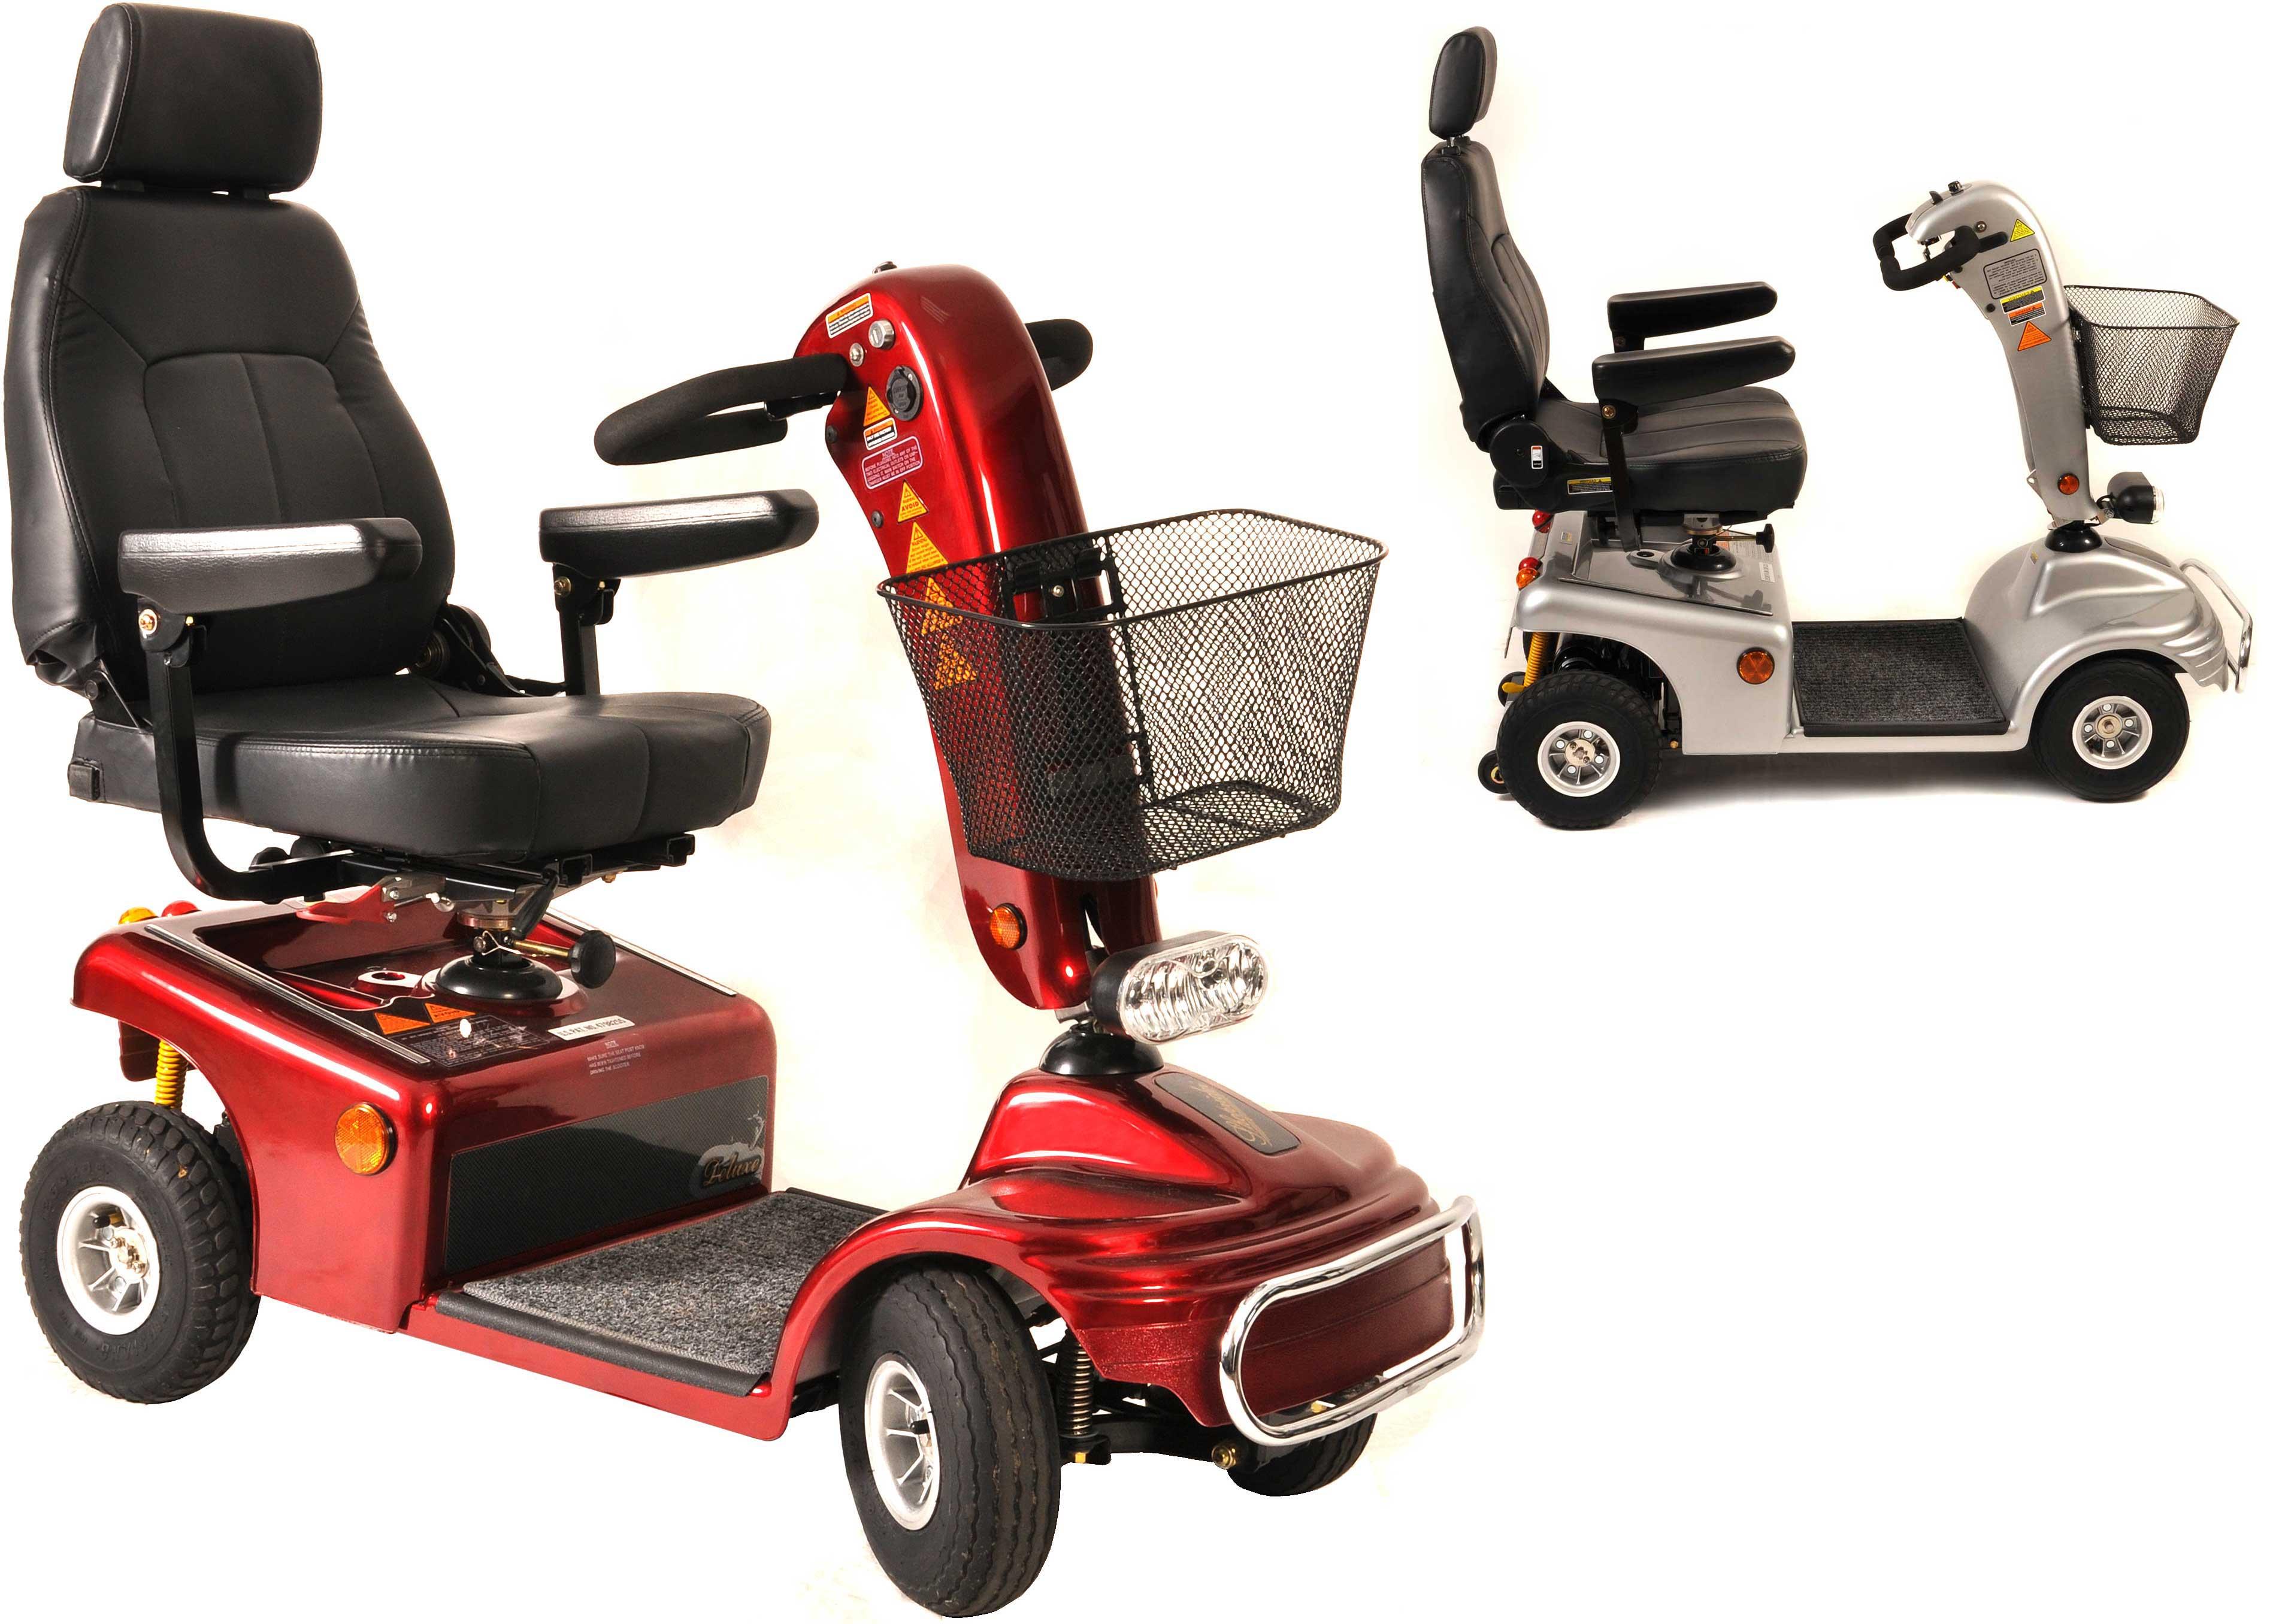 shoprider trip 6 km h elektromobil mc seniorenprodukte. Black Bedroom Furniture Sets. Home Design Ideas